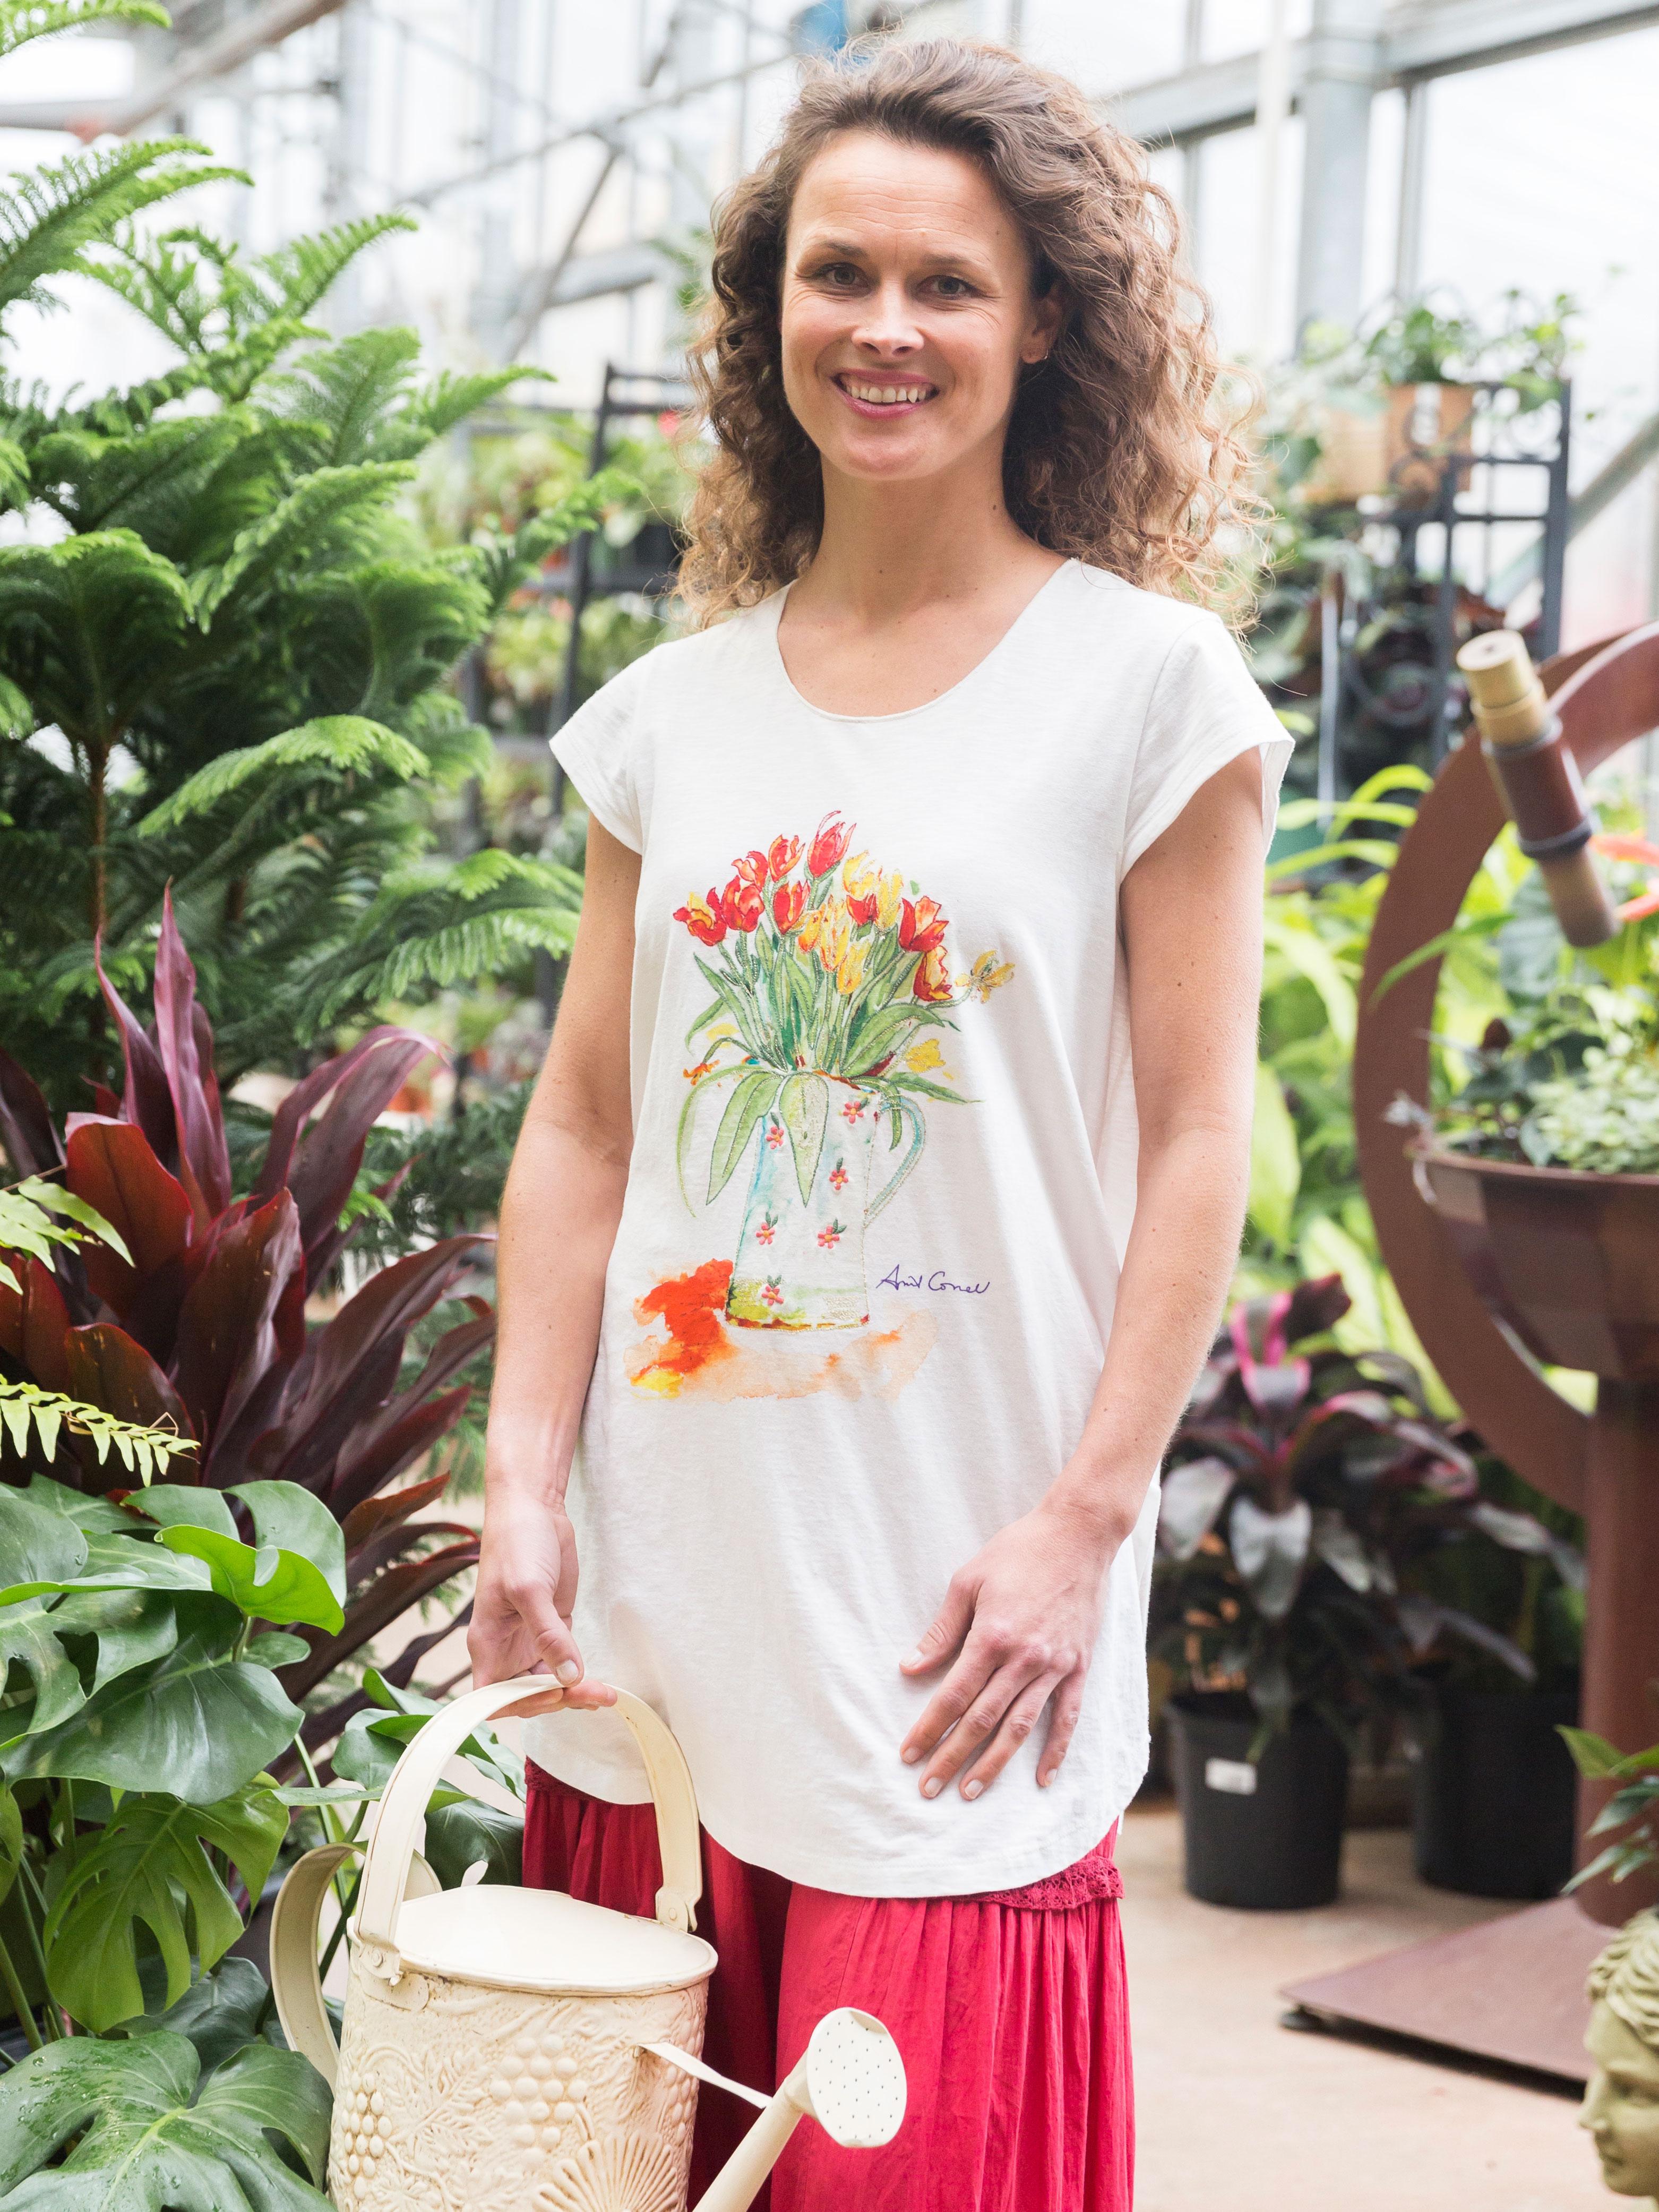 Shirt design ladies - Tulip T Shirt